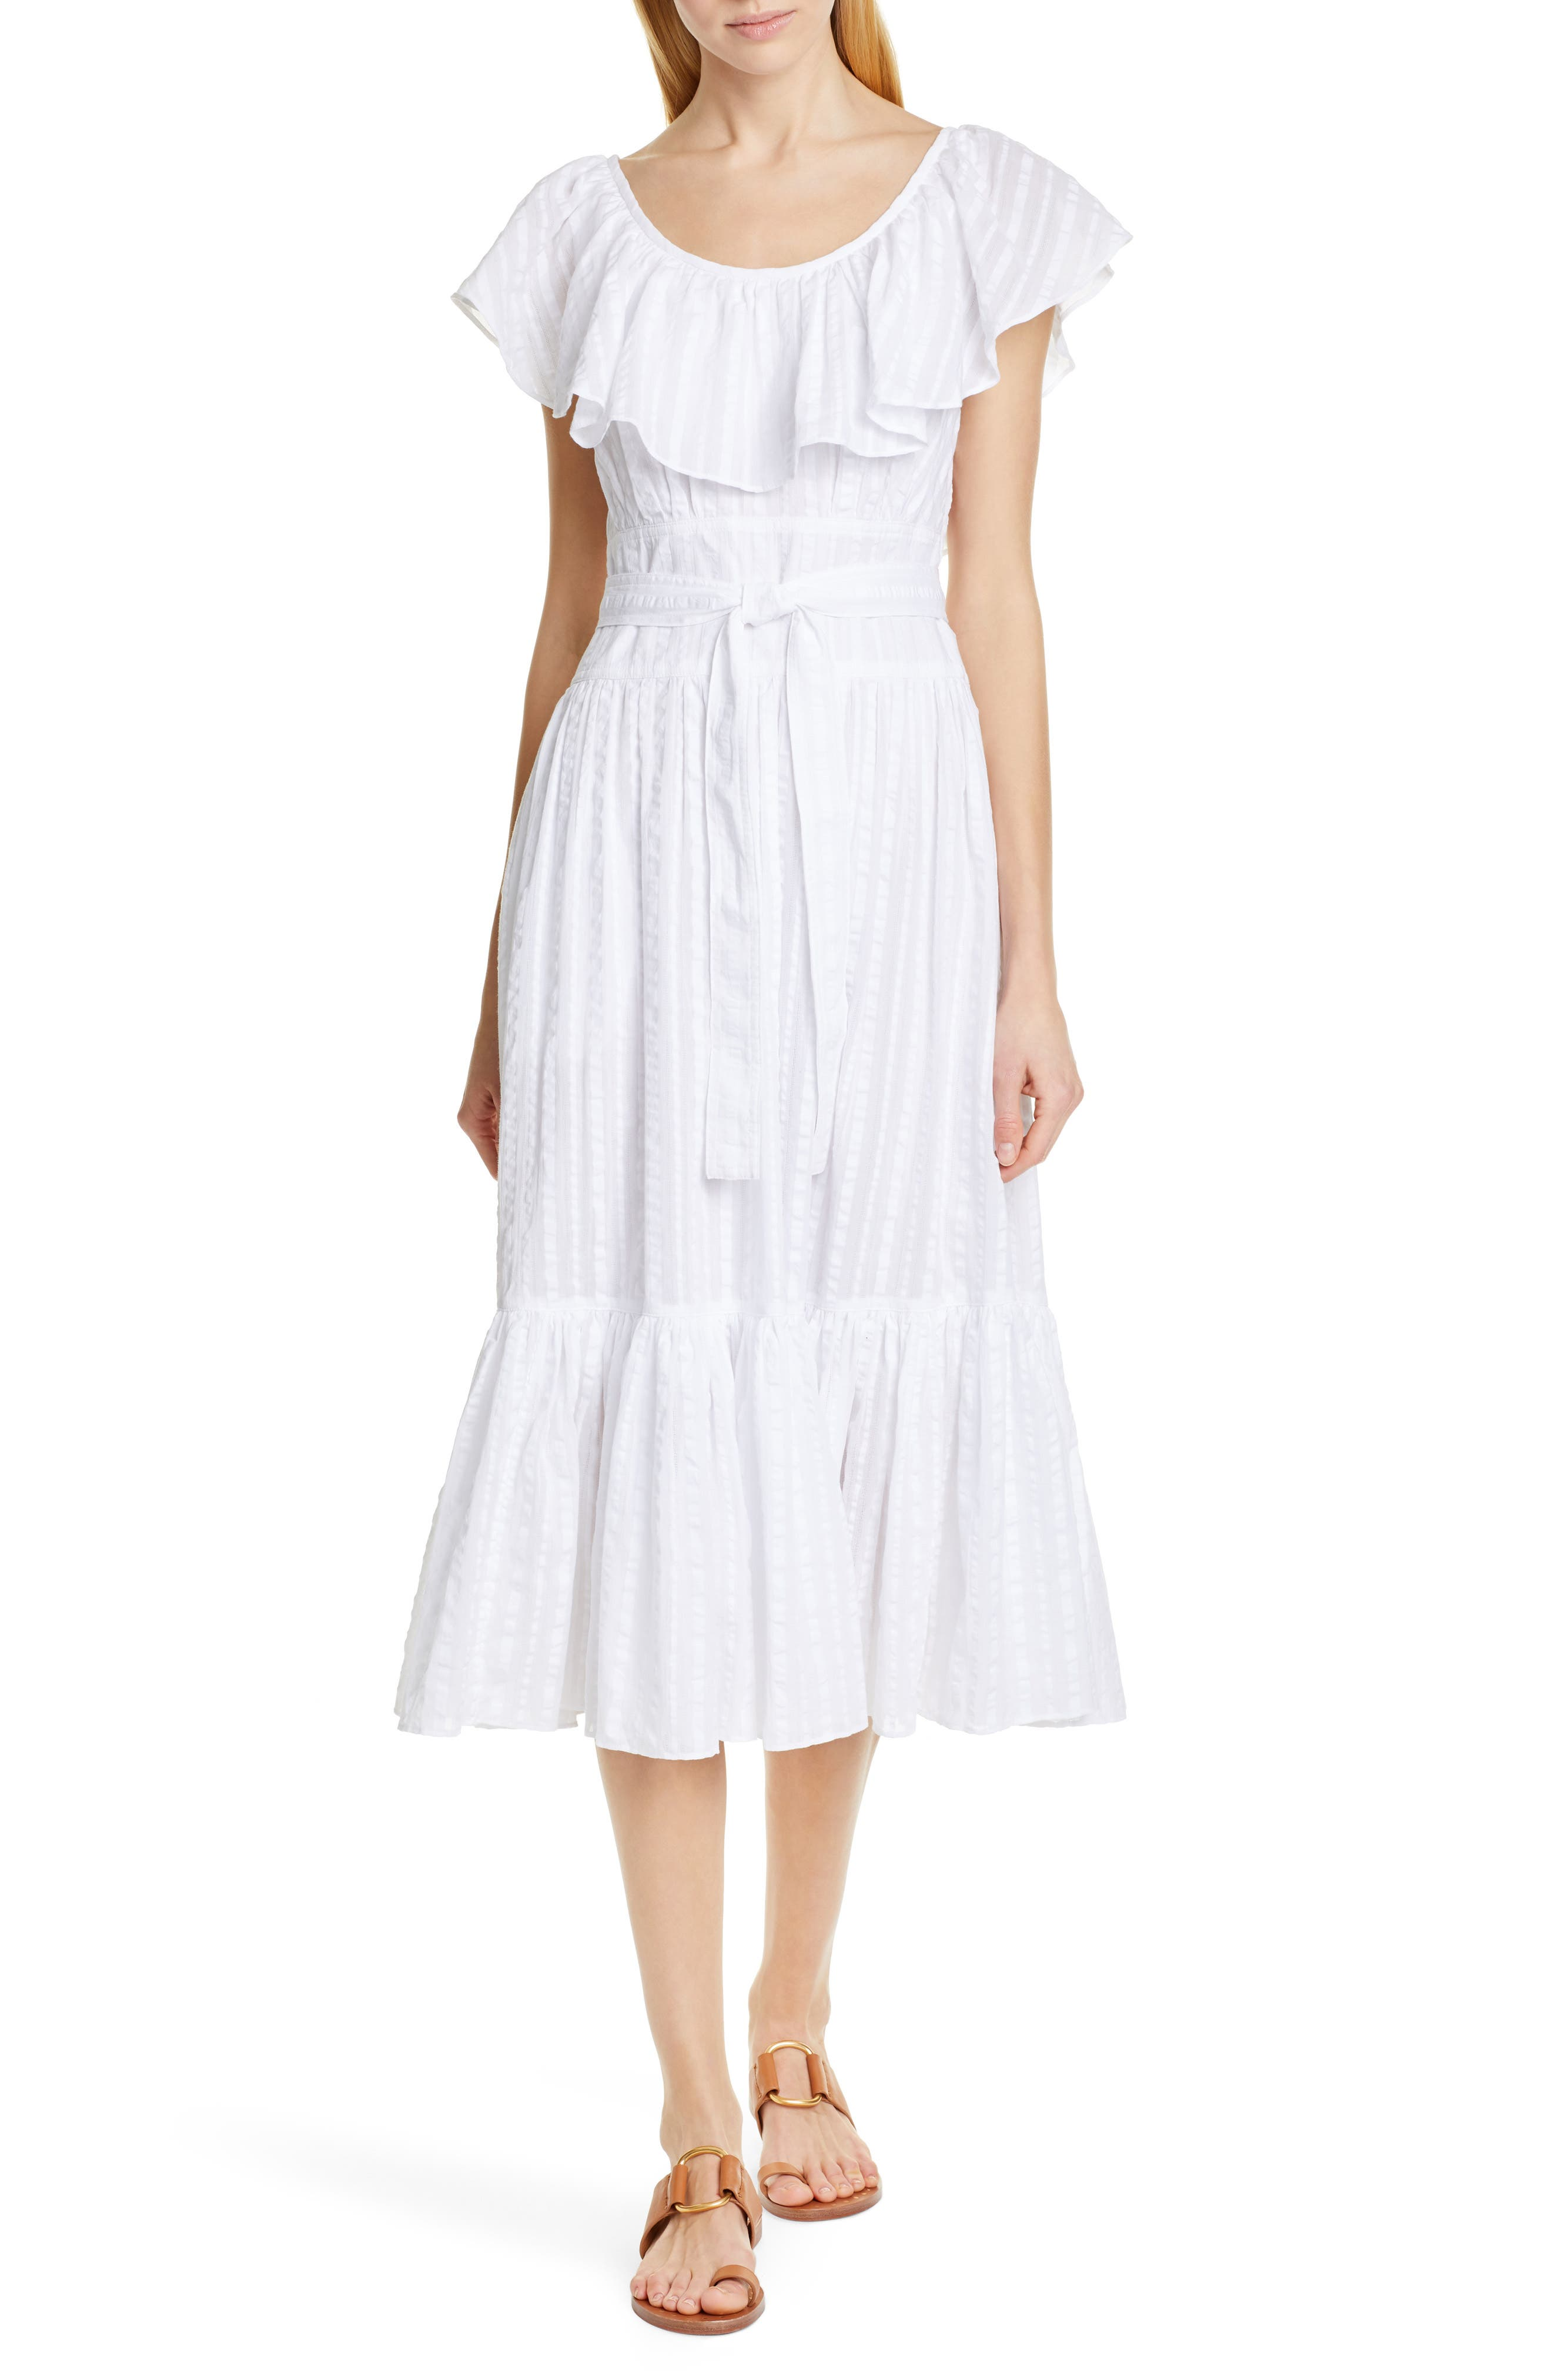 70s Dresses – Disco Dresses, Hippie Dresses, Wrap Dresses Womens Tory Burch Stripe Seersucker Dress $448.00 AT vintagedancer.com